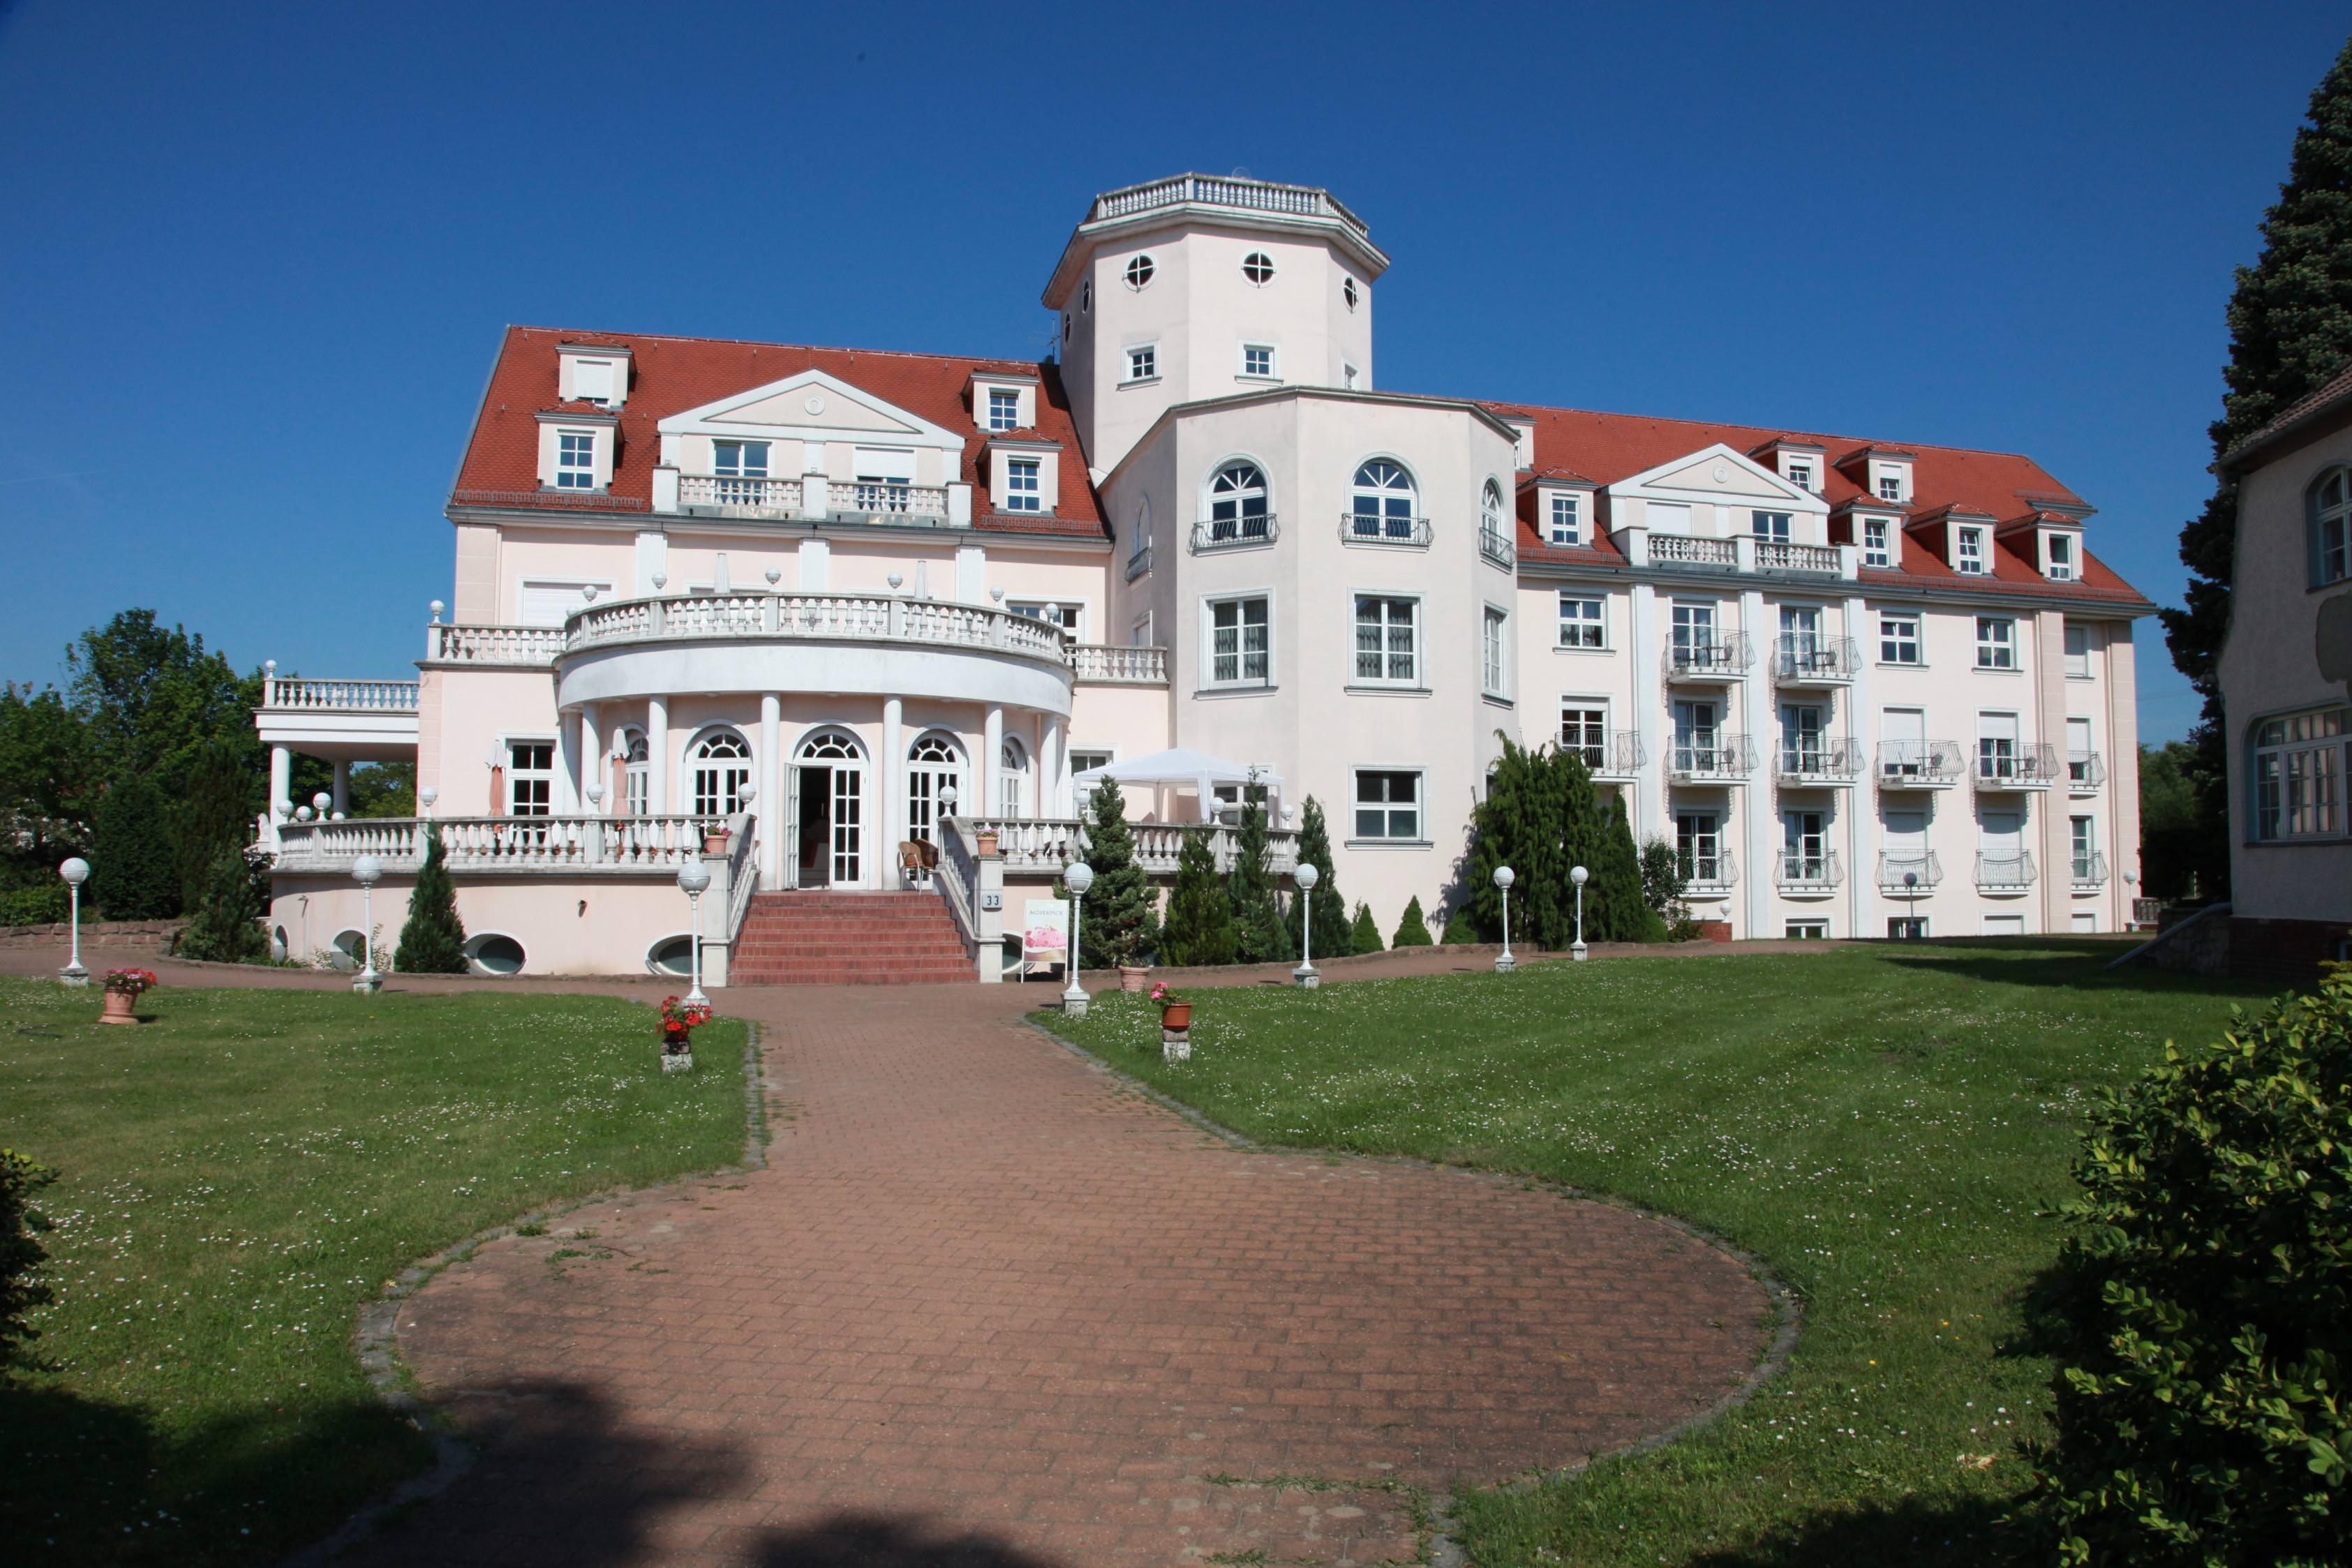 Park Hotel Kaulsdorf